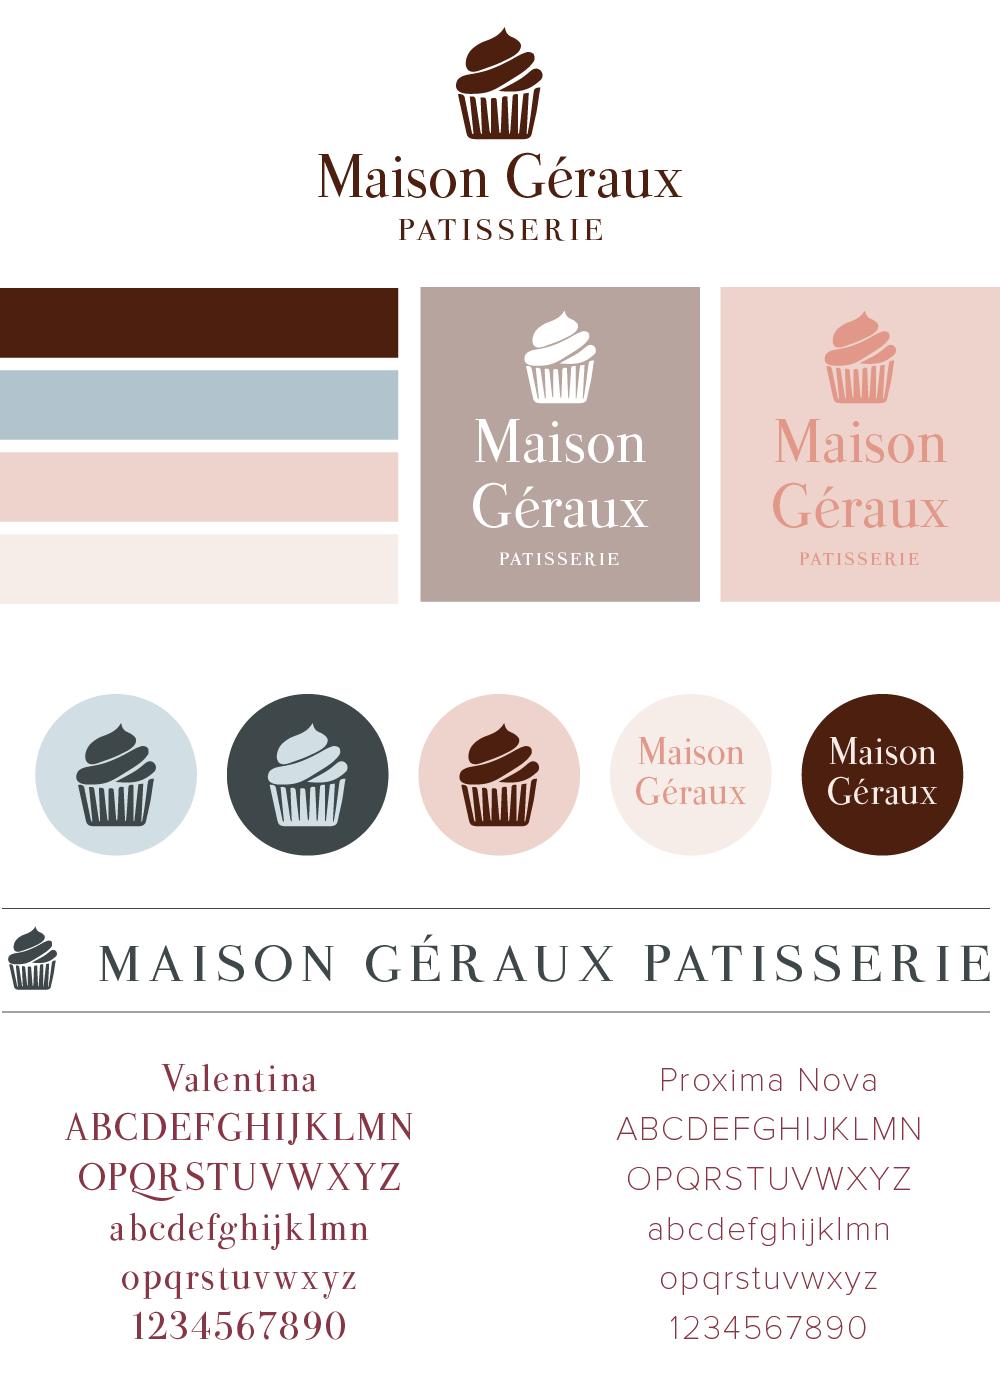 Maison-Geraux-Branding.png